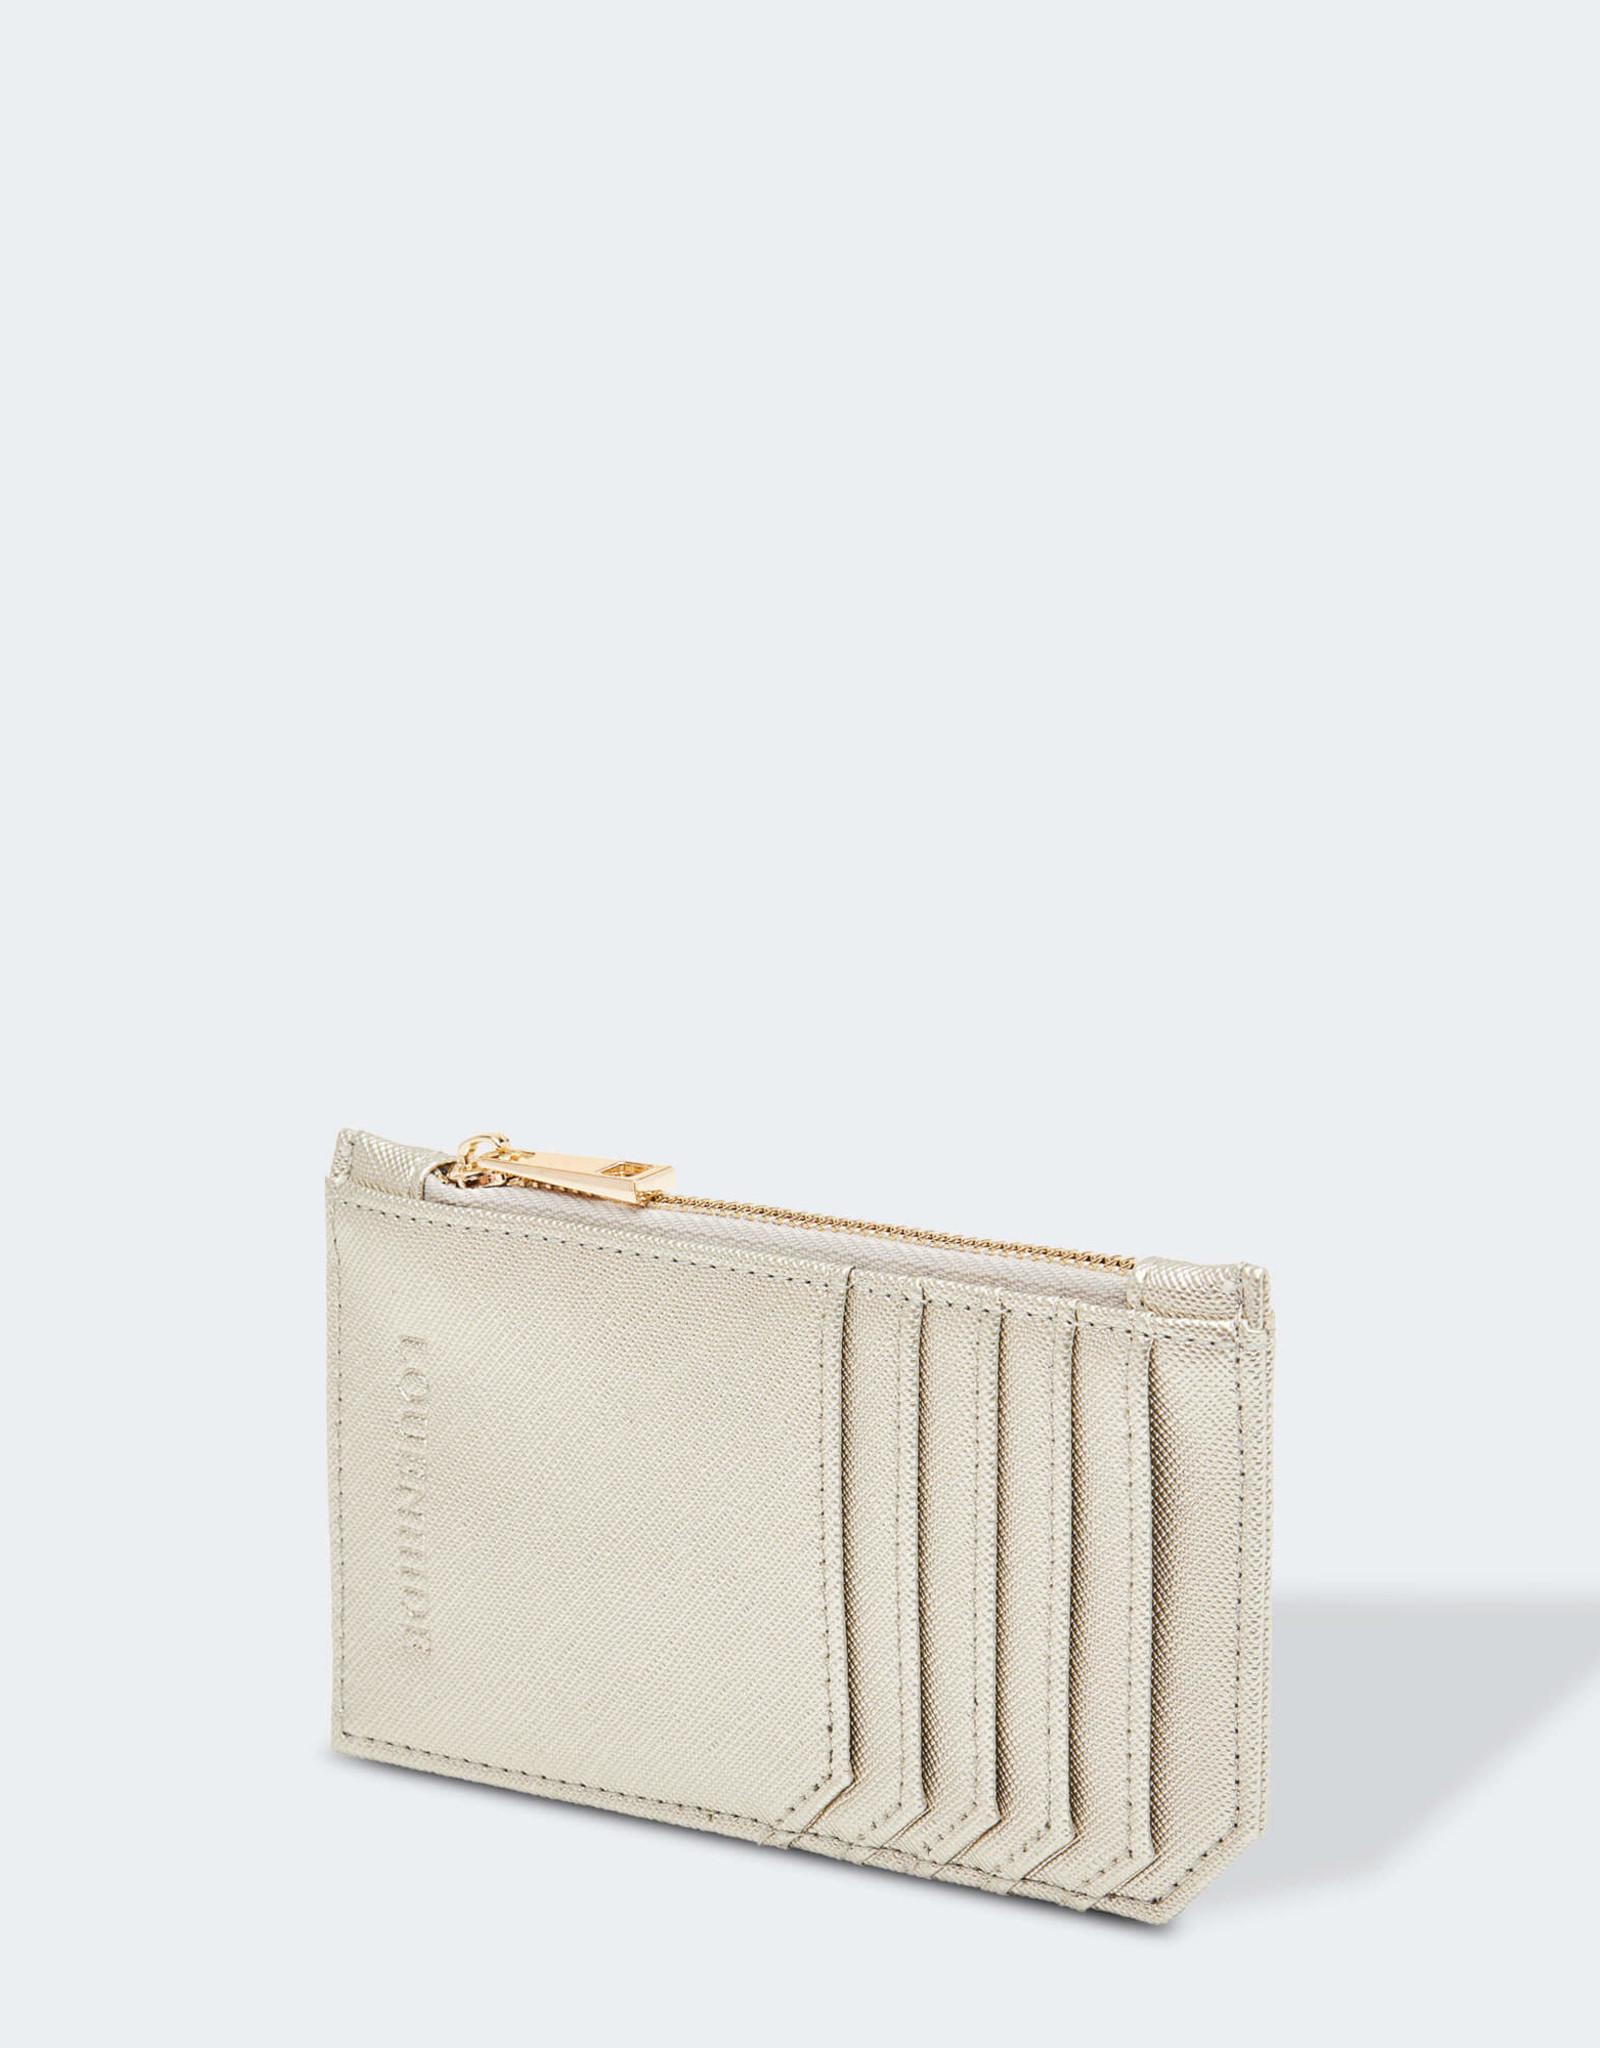 Tia Hatch Silver Card Holder